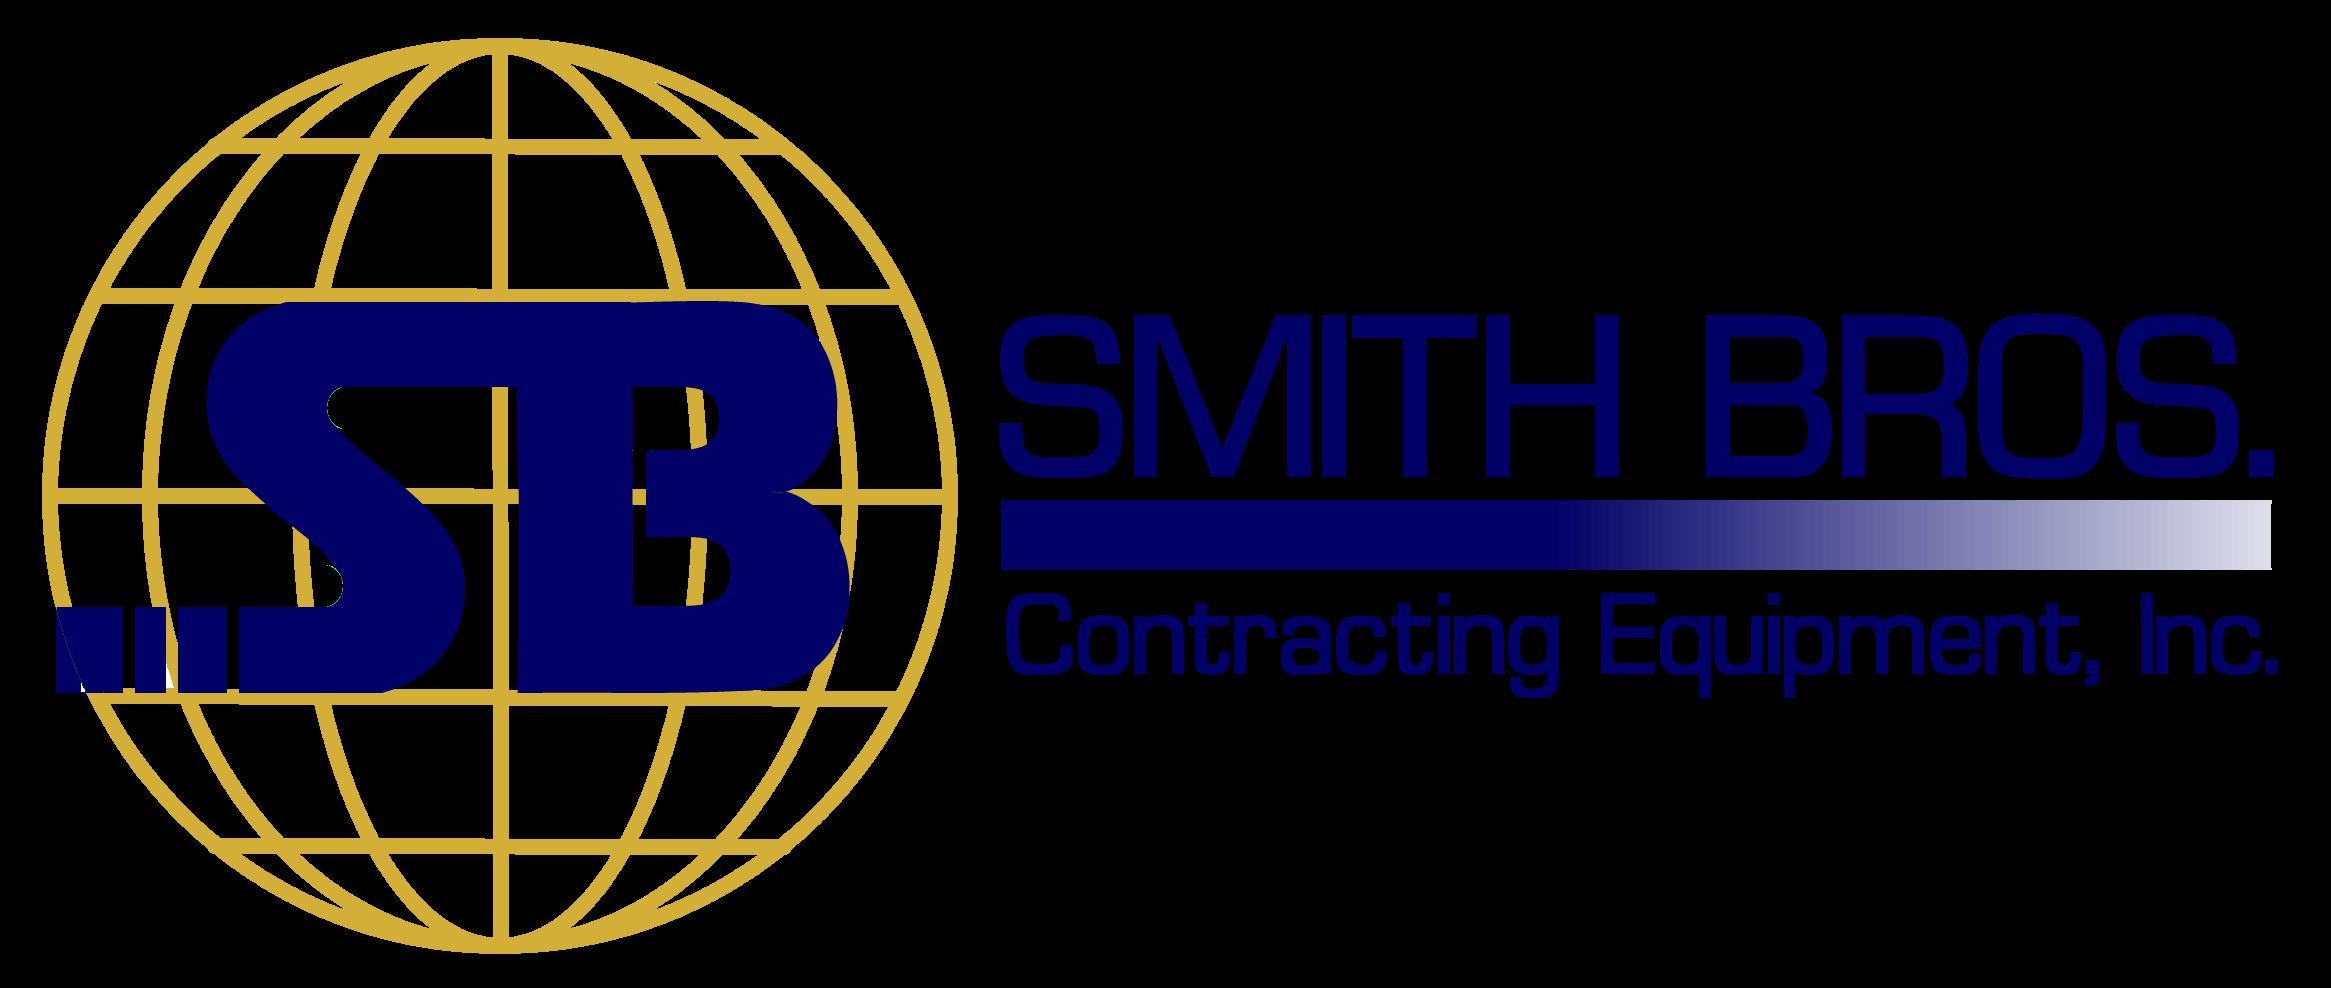 Smith Bros. Contracting Equipment